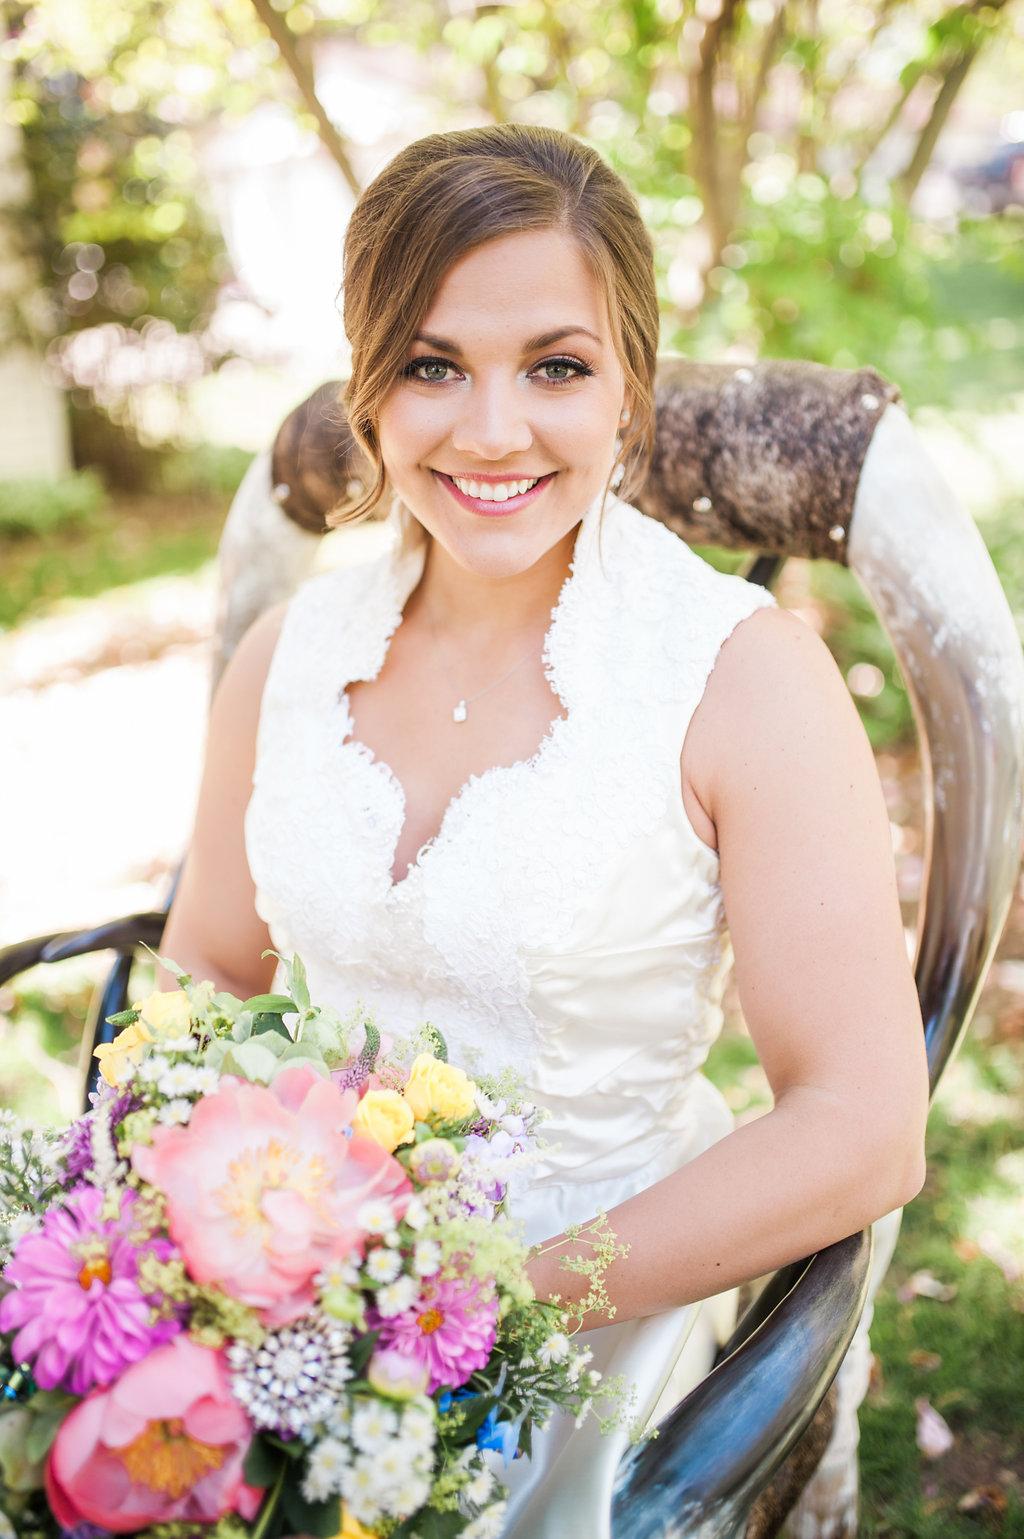 Farm Wedding Dress - Iowa Farm Wedding - Private Estate Weddings